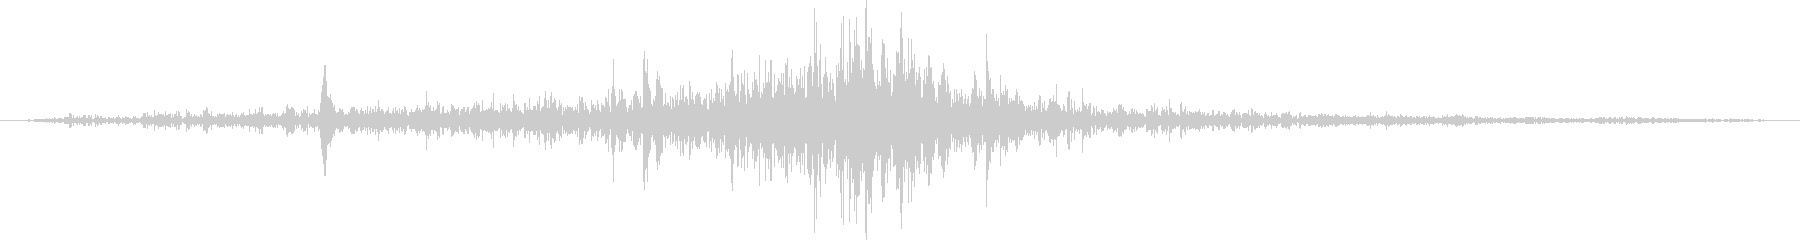 Snj-6シングルプロップ:Ext...の未再生の波形